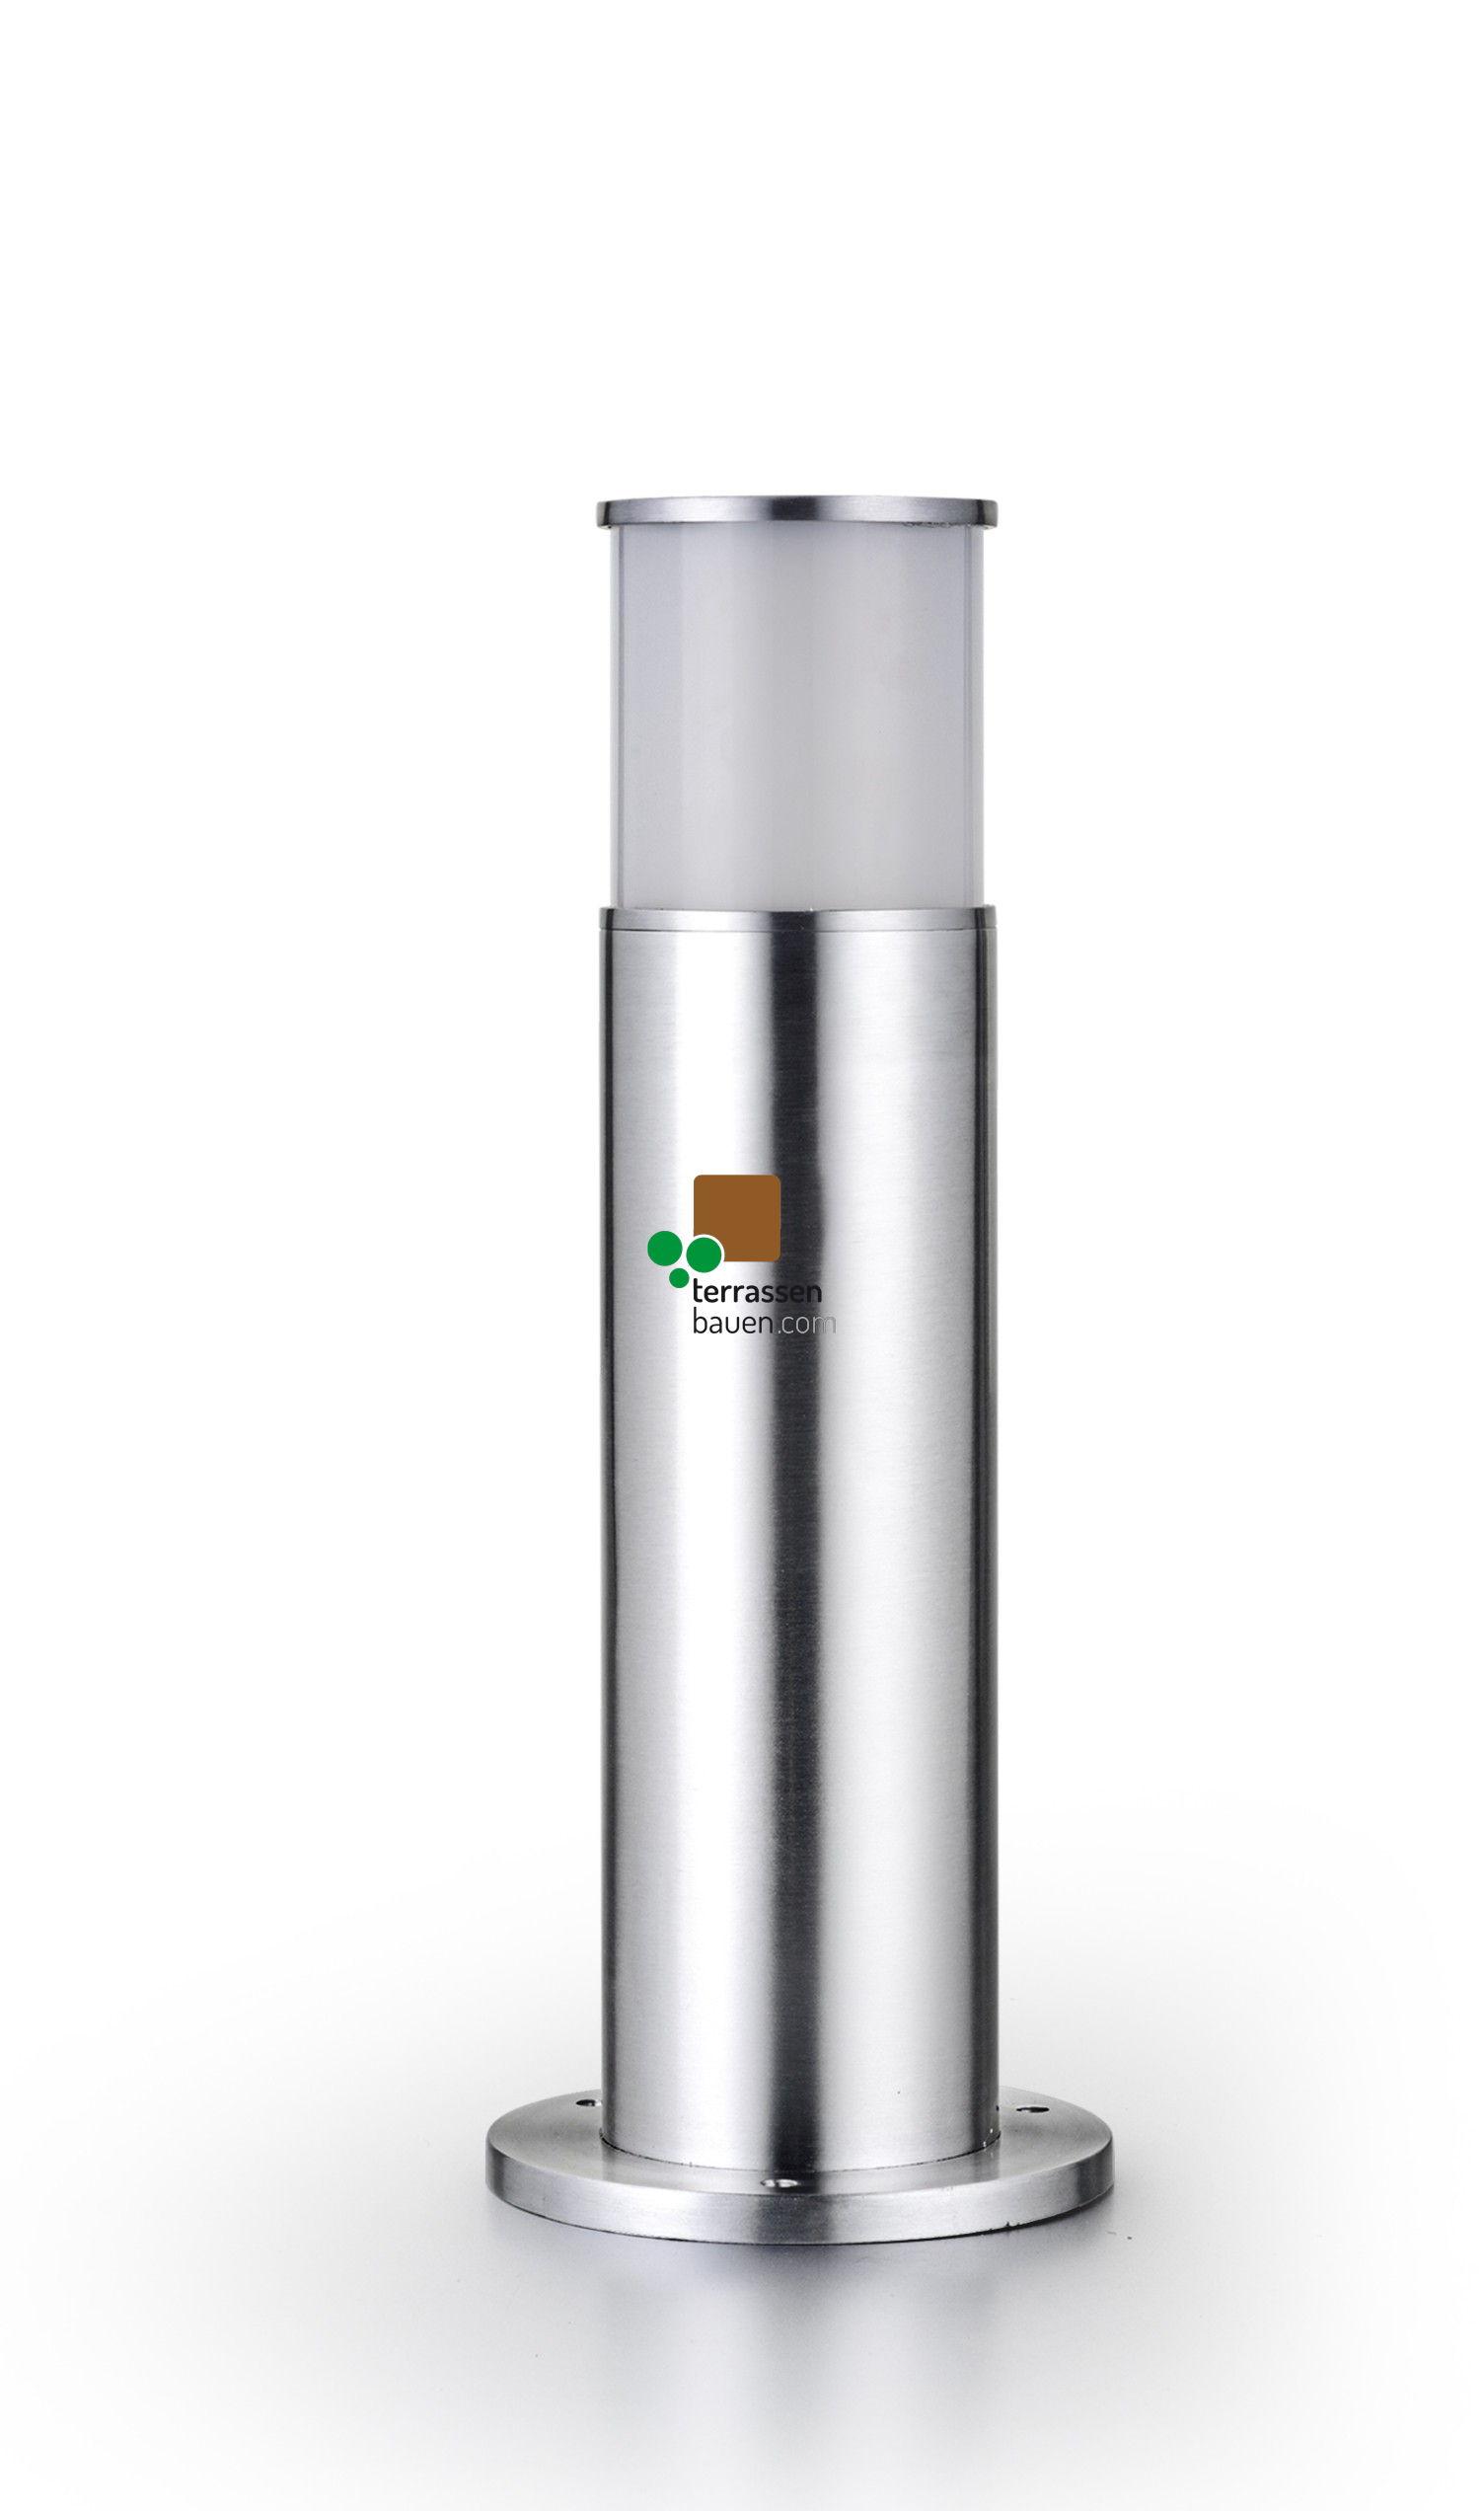 EasyConnect Edelstahl Stand-Außenleuchte LED, 45cm, 11cm ø, 5W, 230VAC, 1 Stück